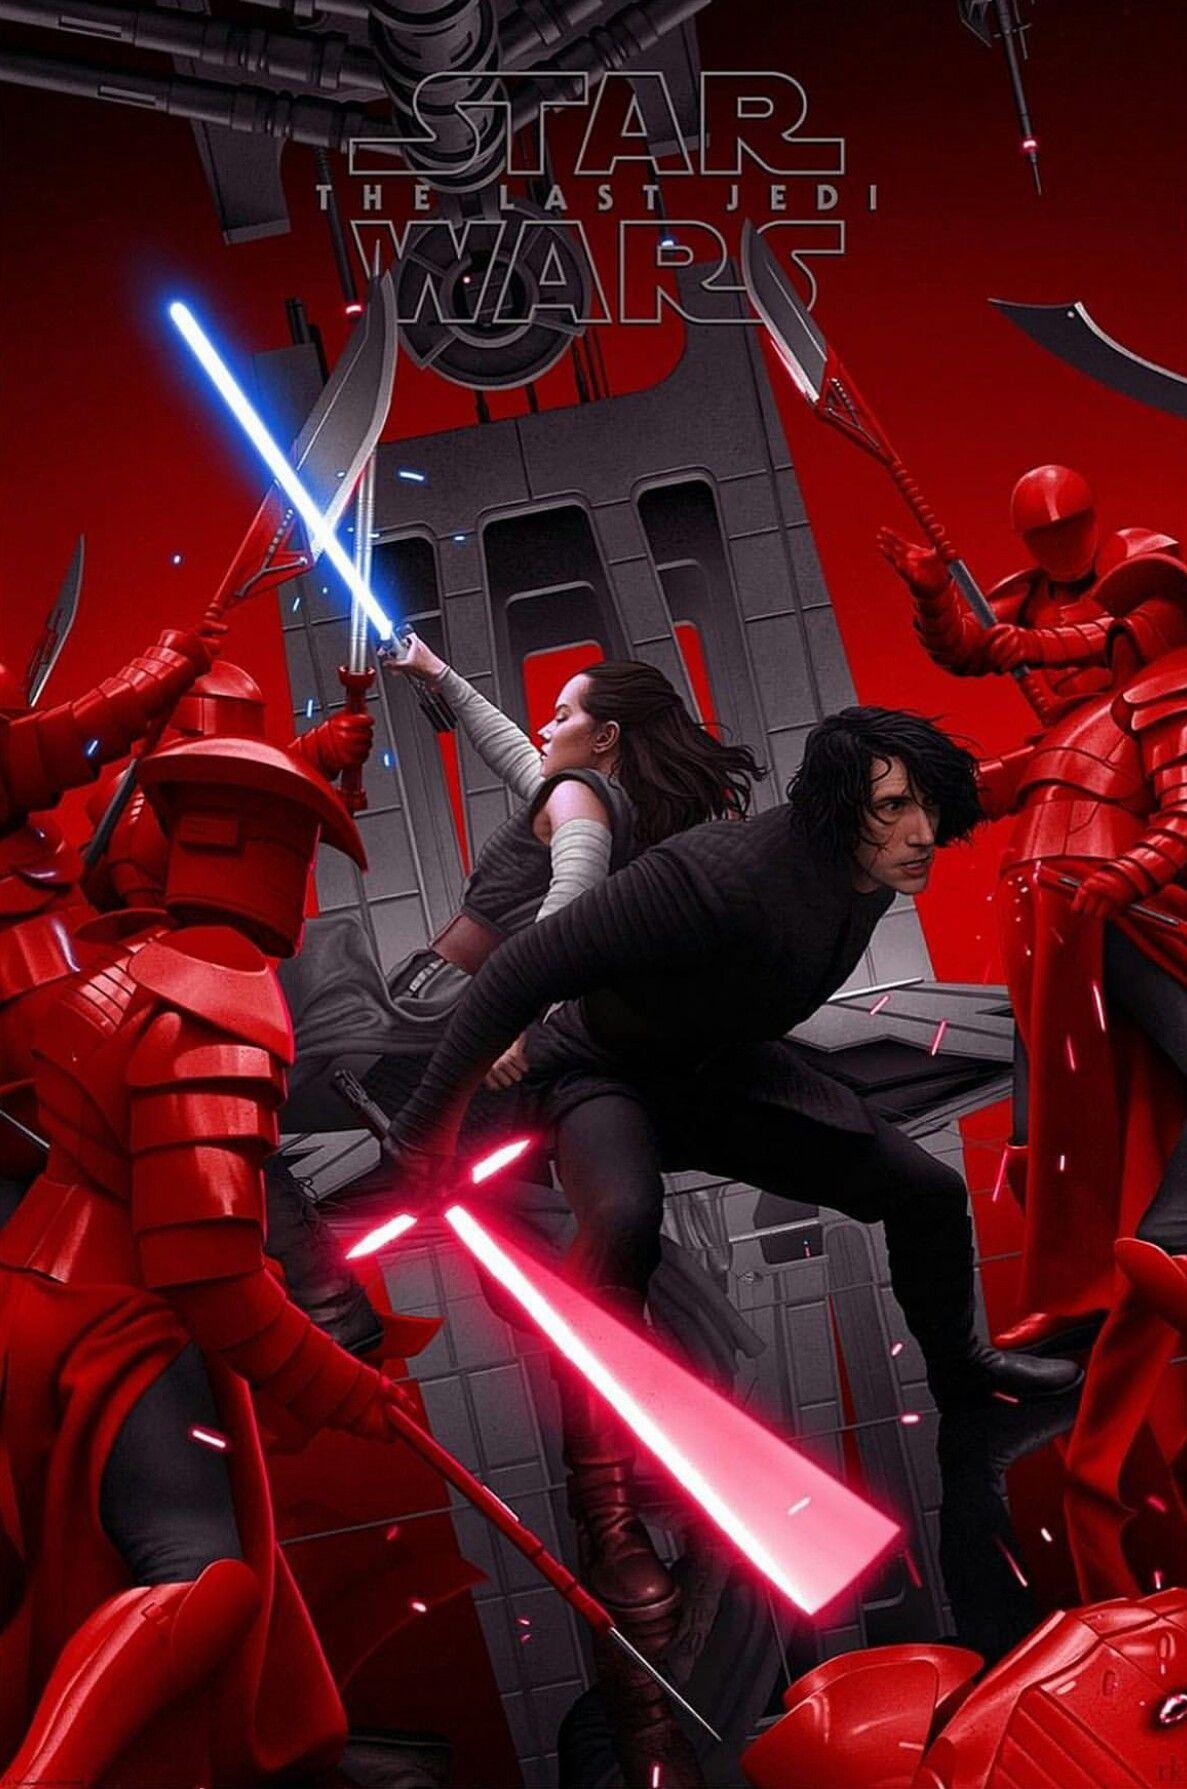 Pin De Brian Thompson Em Star Wars Simbolos Star Wars Imagens Star Wars Papel De Parede Star Wars